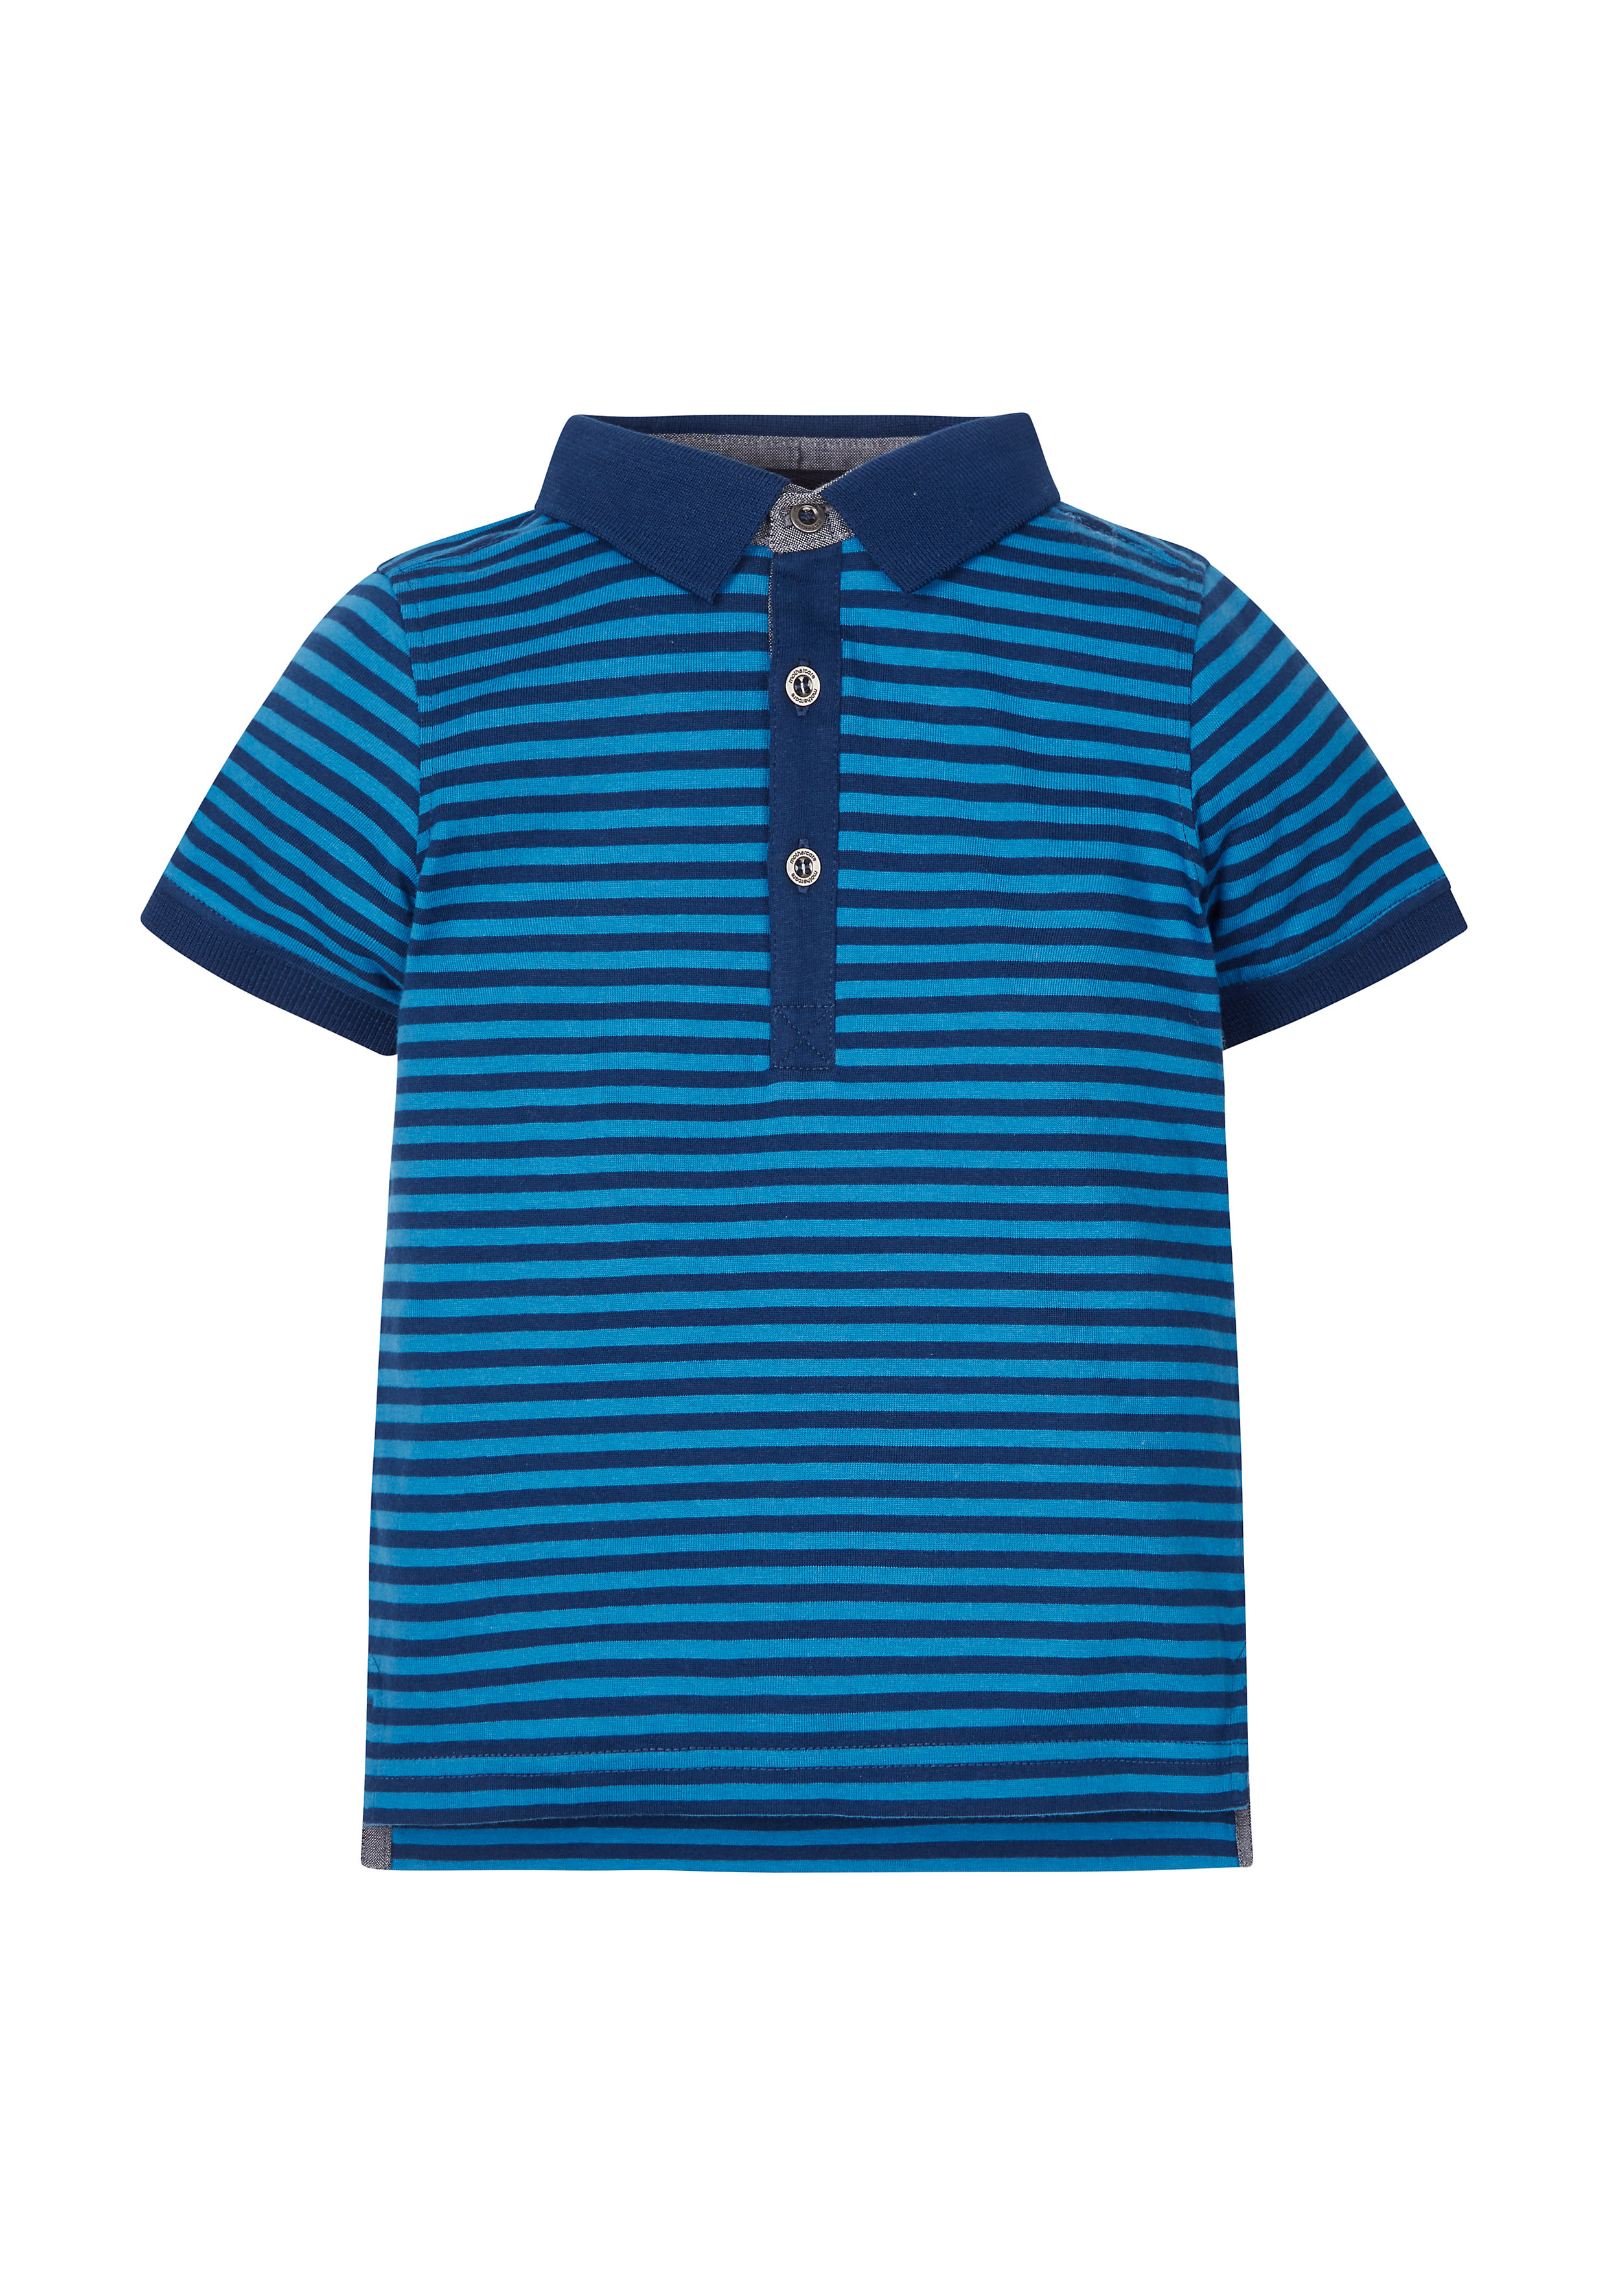 Mothercare | Boys Stripe Polo T-Shirt - Blue